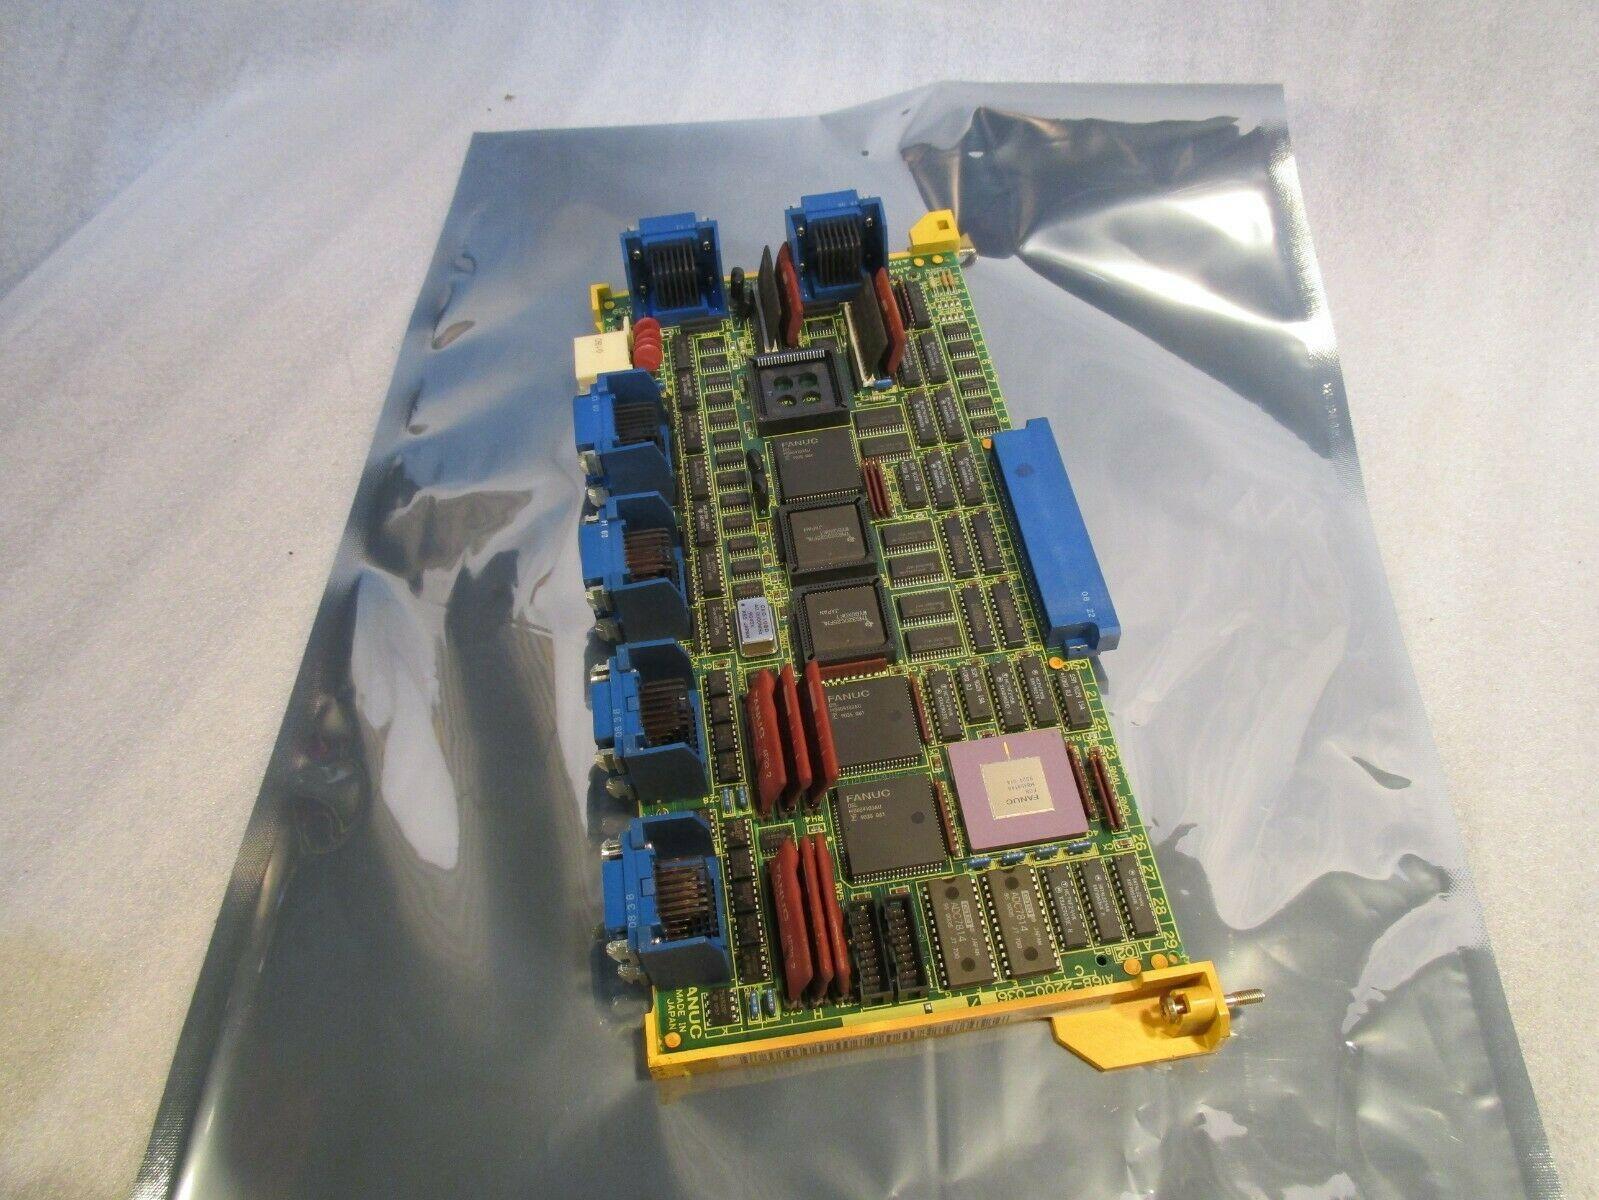 Fanuc CNC Control Board A16B-2200-0360 /04B Fanuc 0T 0M CNC Control Board